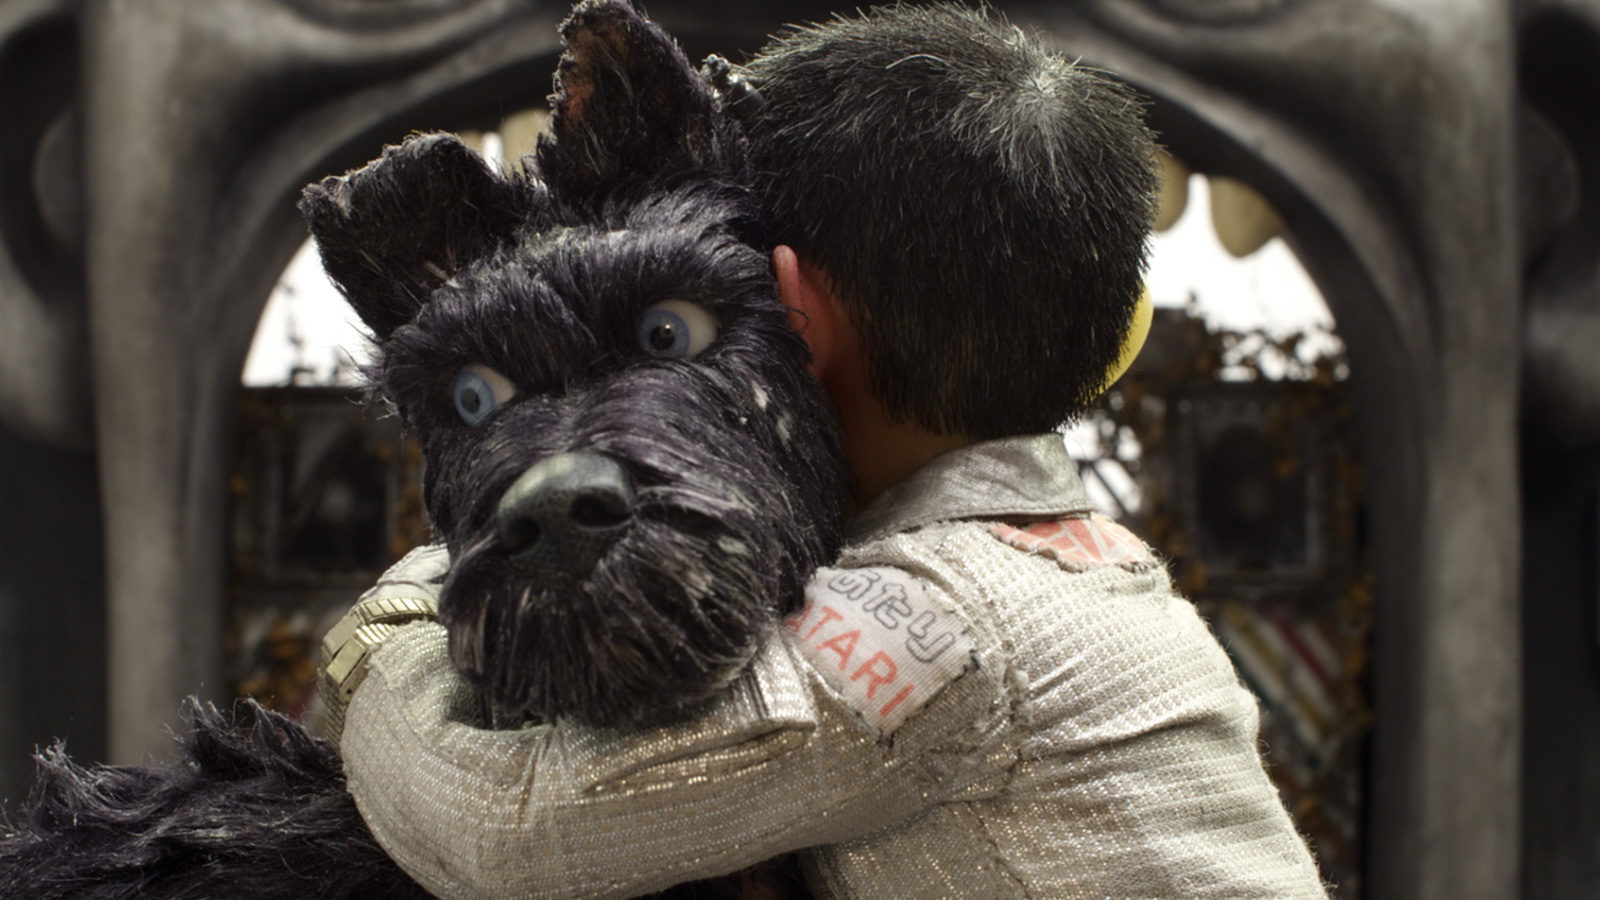 Isle-of-Dogs-hug.jpg